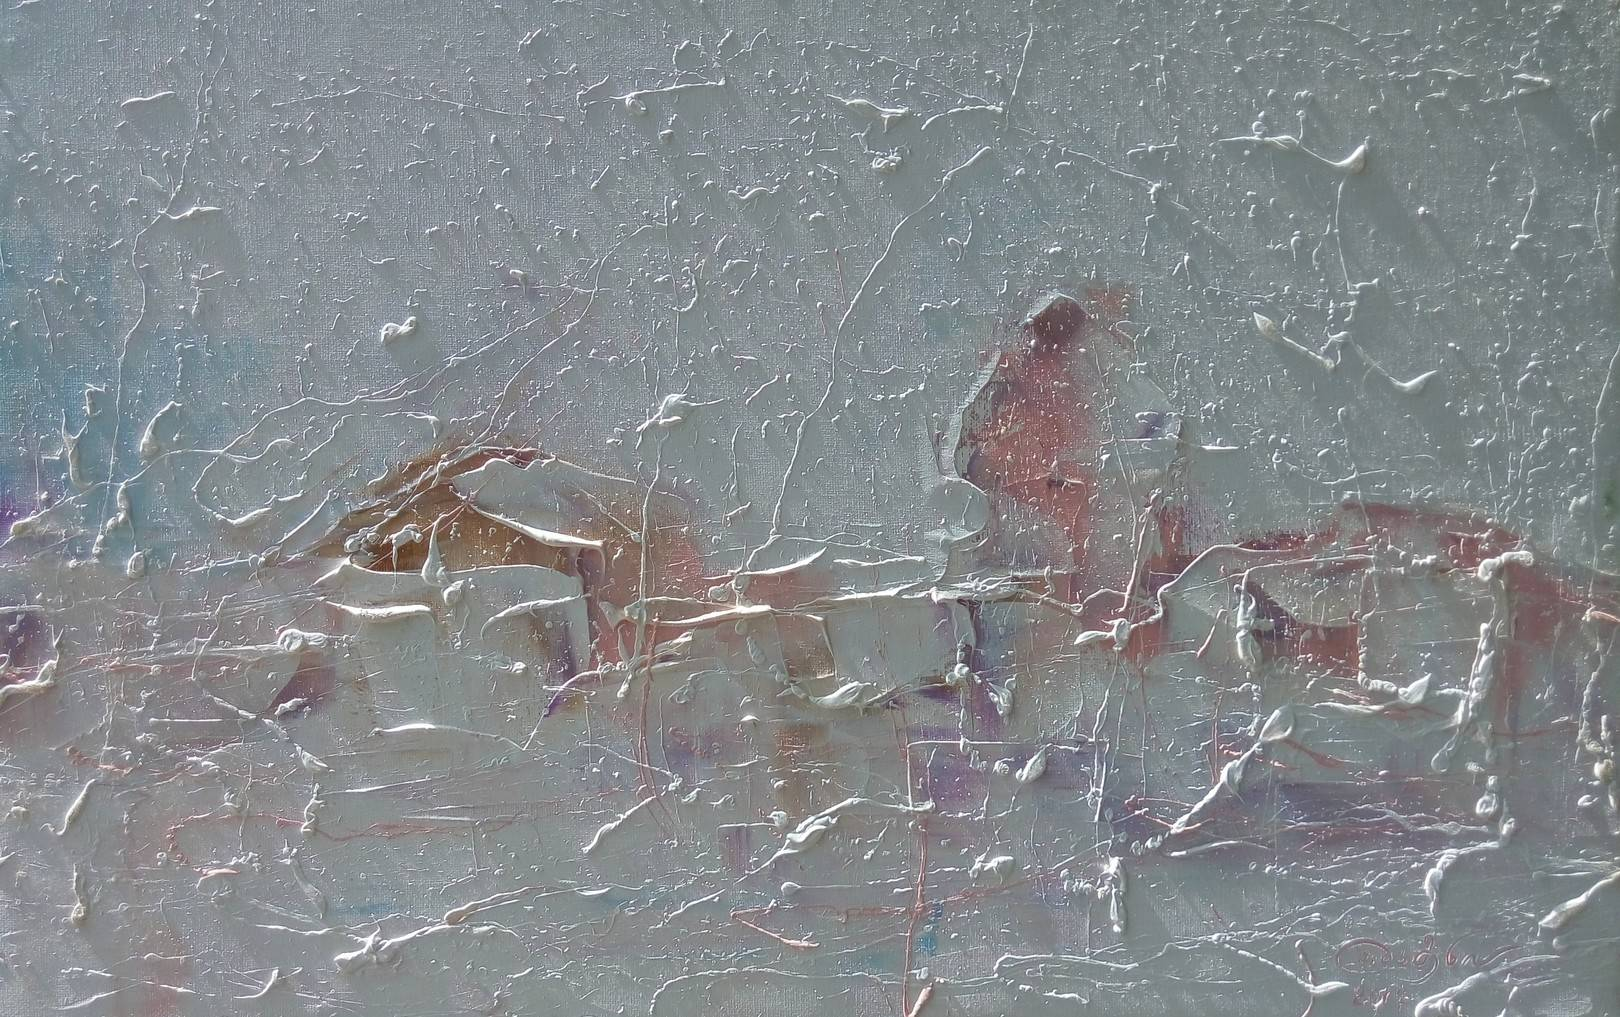 «Улицы Тбилиси зимой»               холст, масло «Tbilisi streets in winter»                 oil on canvas                                                          26x39,  2017